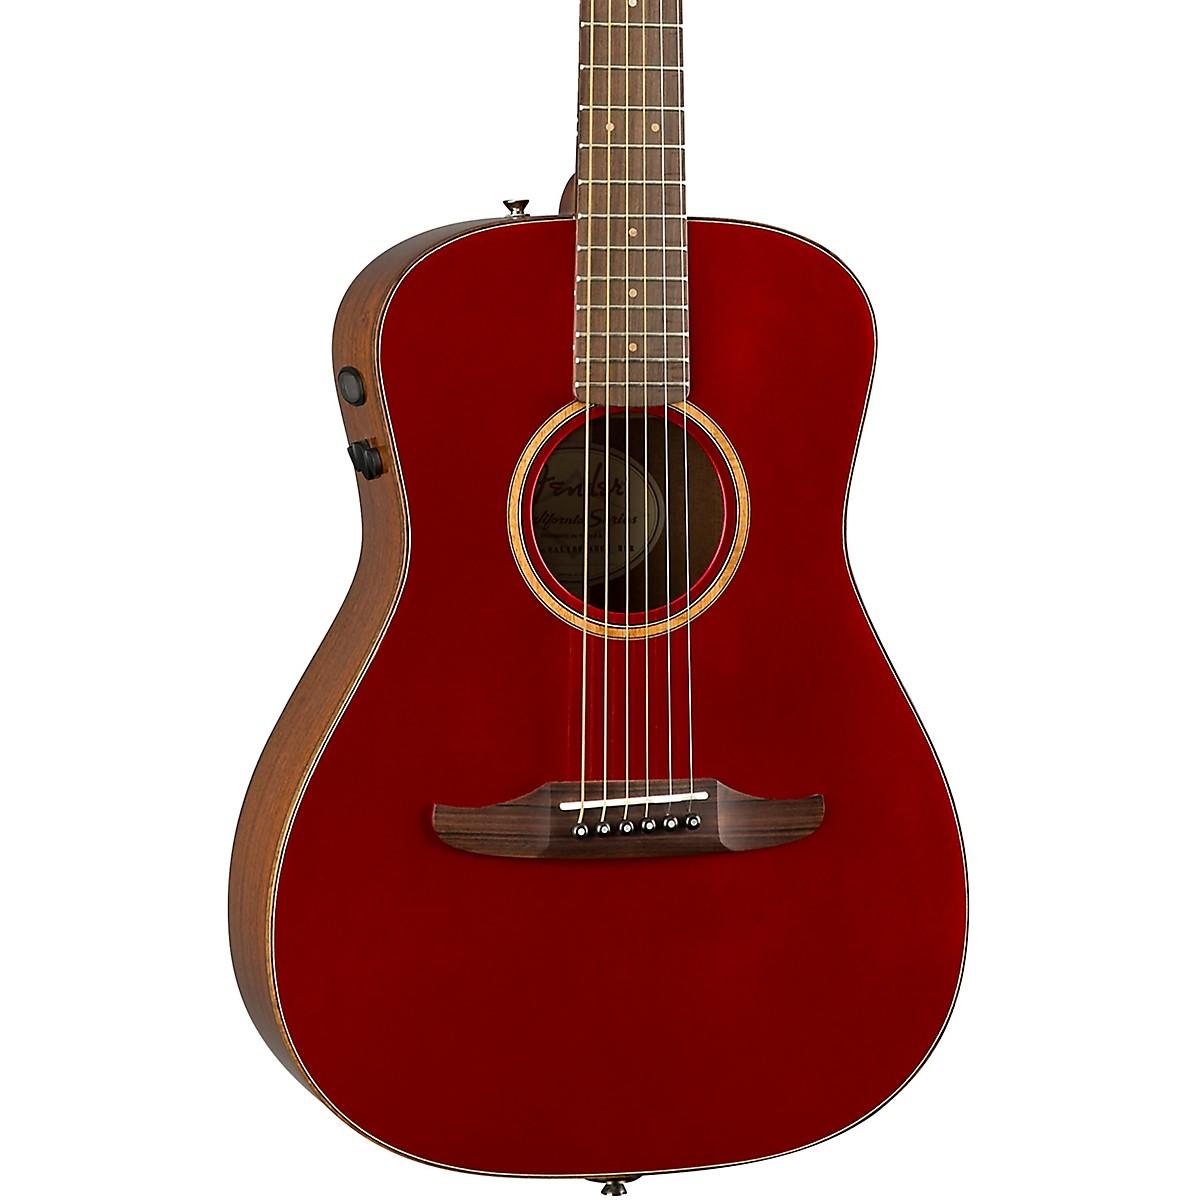 Fender California Malibu Classic Acoustic-Electric Guitar